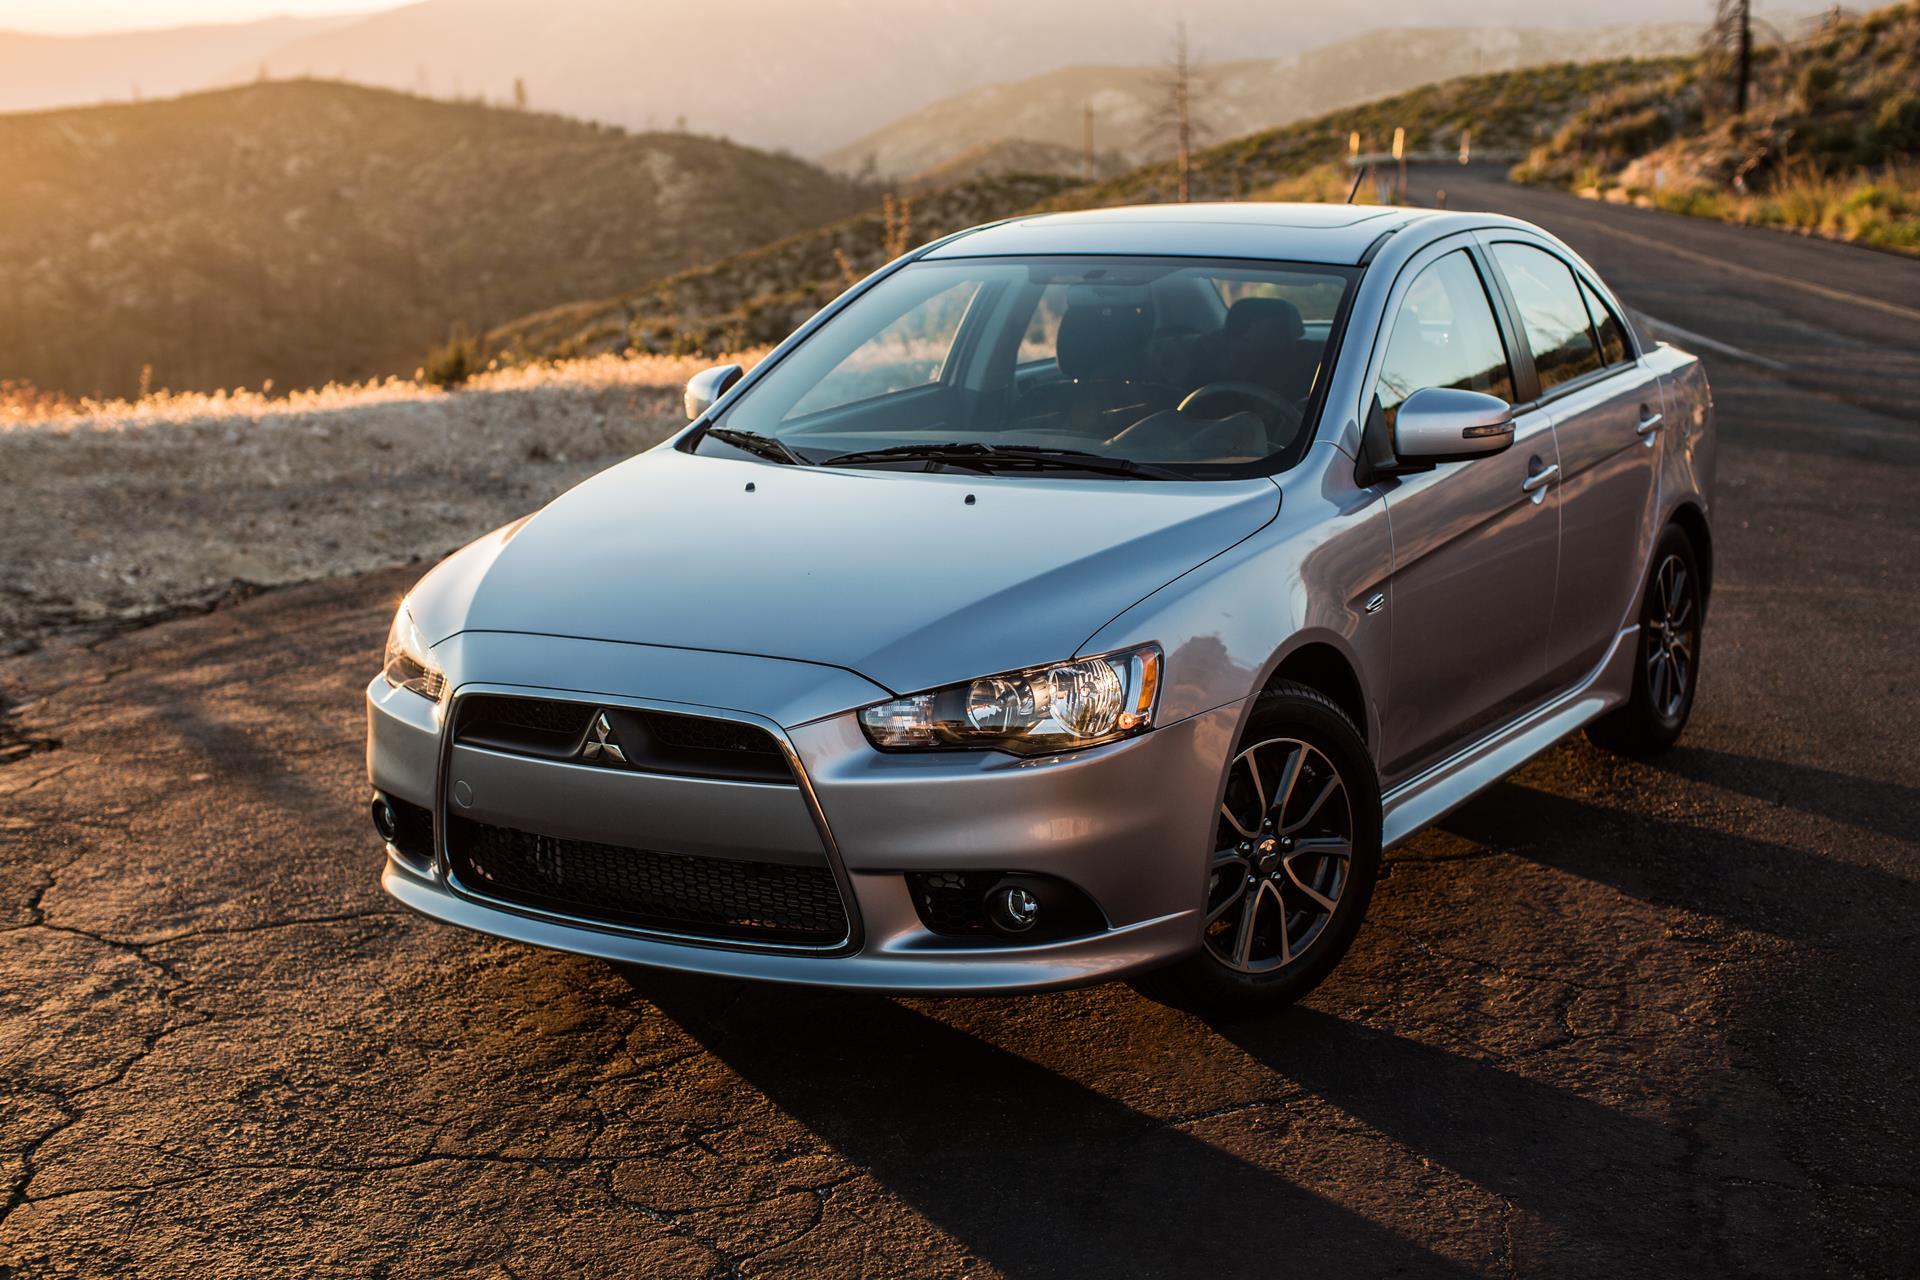 2015 Mitsubishi Lancer News and Information